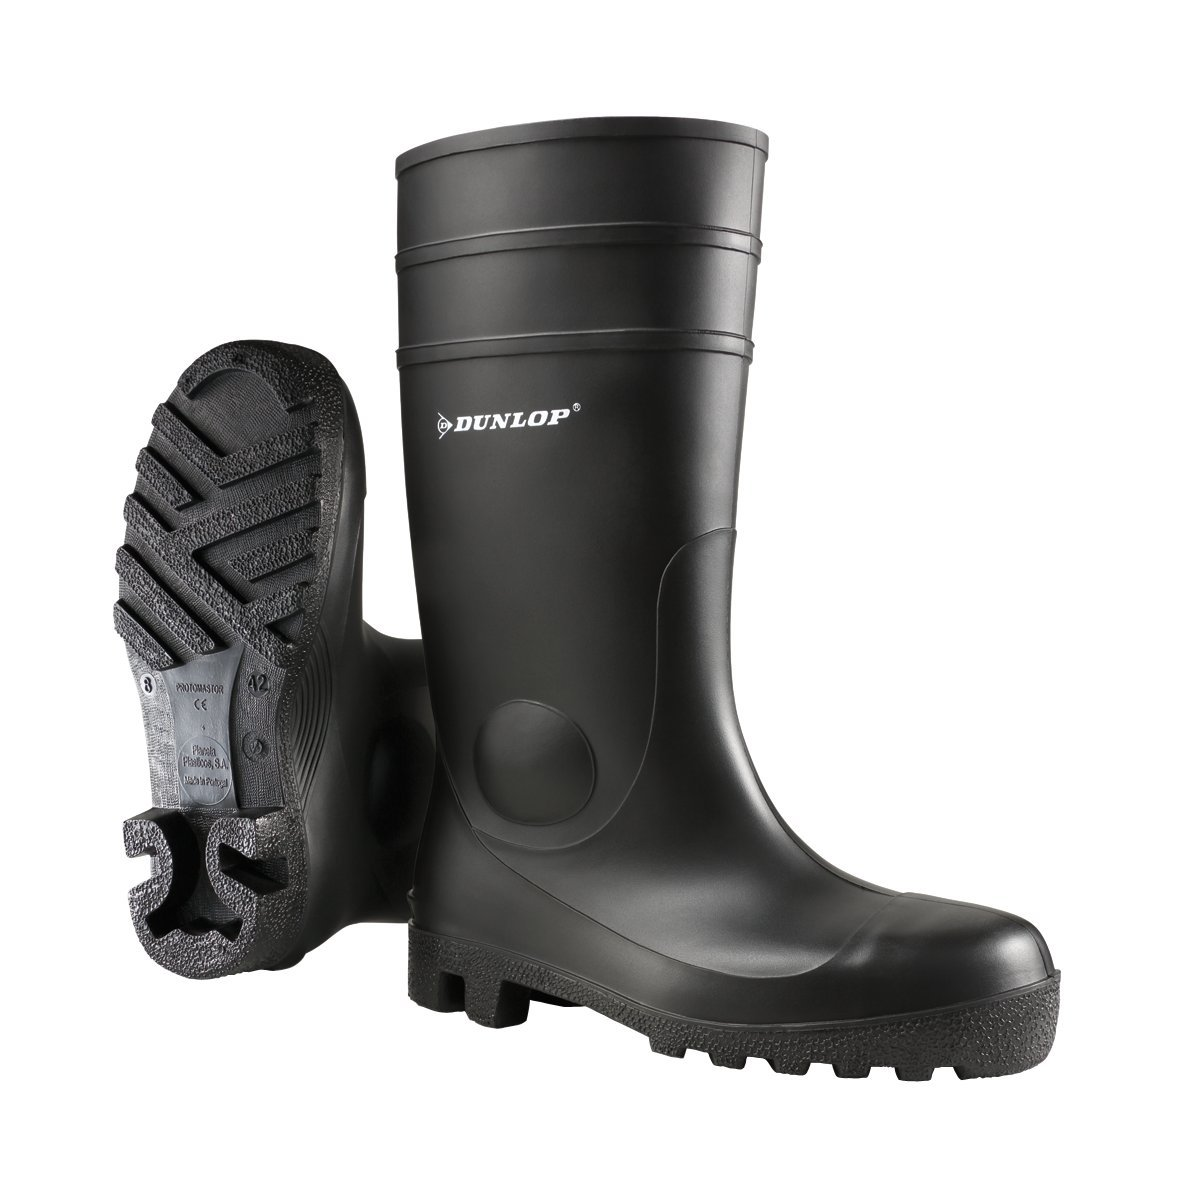 Bottes FS1600/142PP Dunlop (schwarz(zwart) FS1600/142PP unisexe unisexe Noir (schwarz(zwart) 00) 30c1030 - boatplans.space